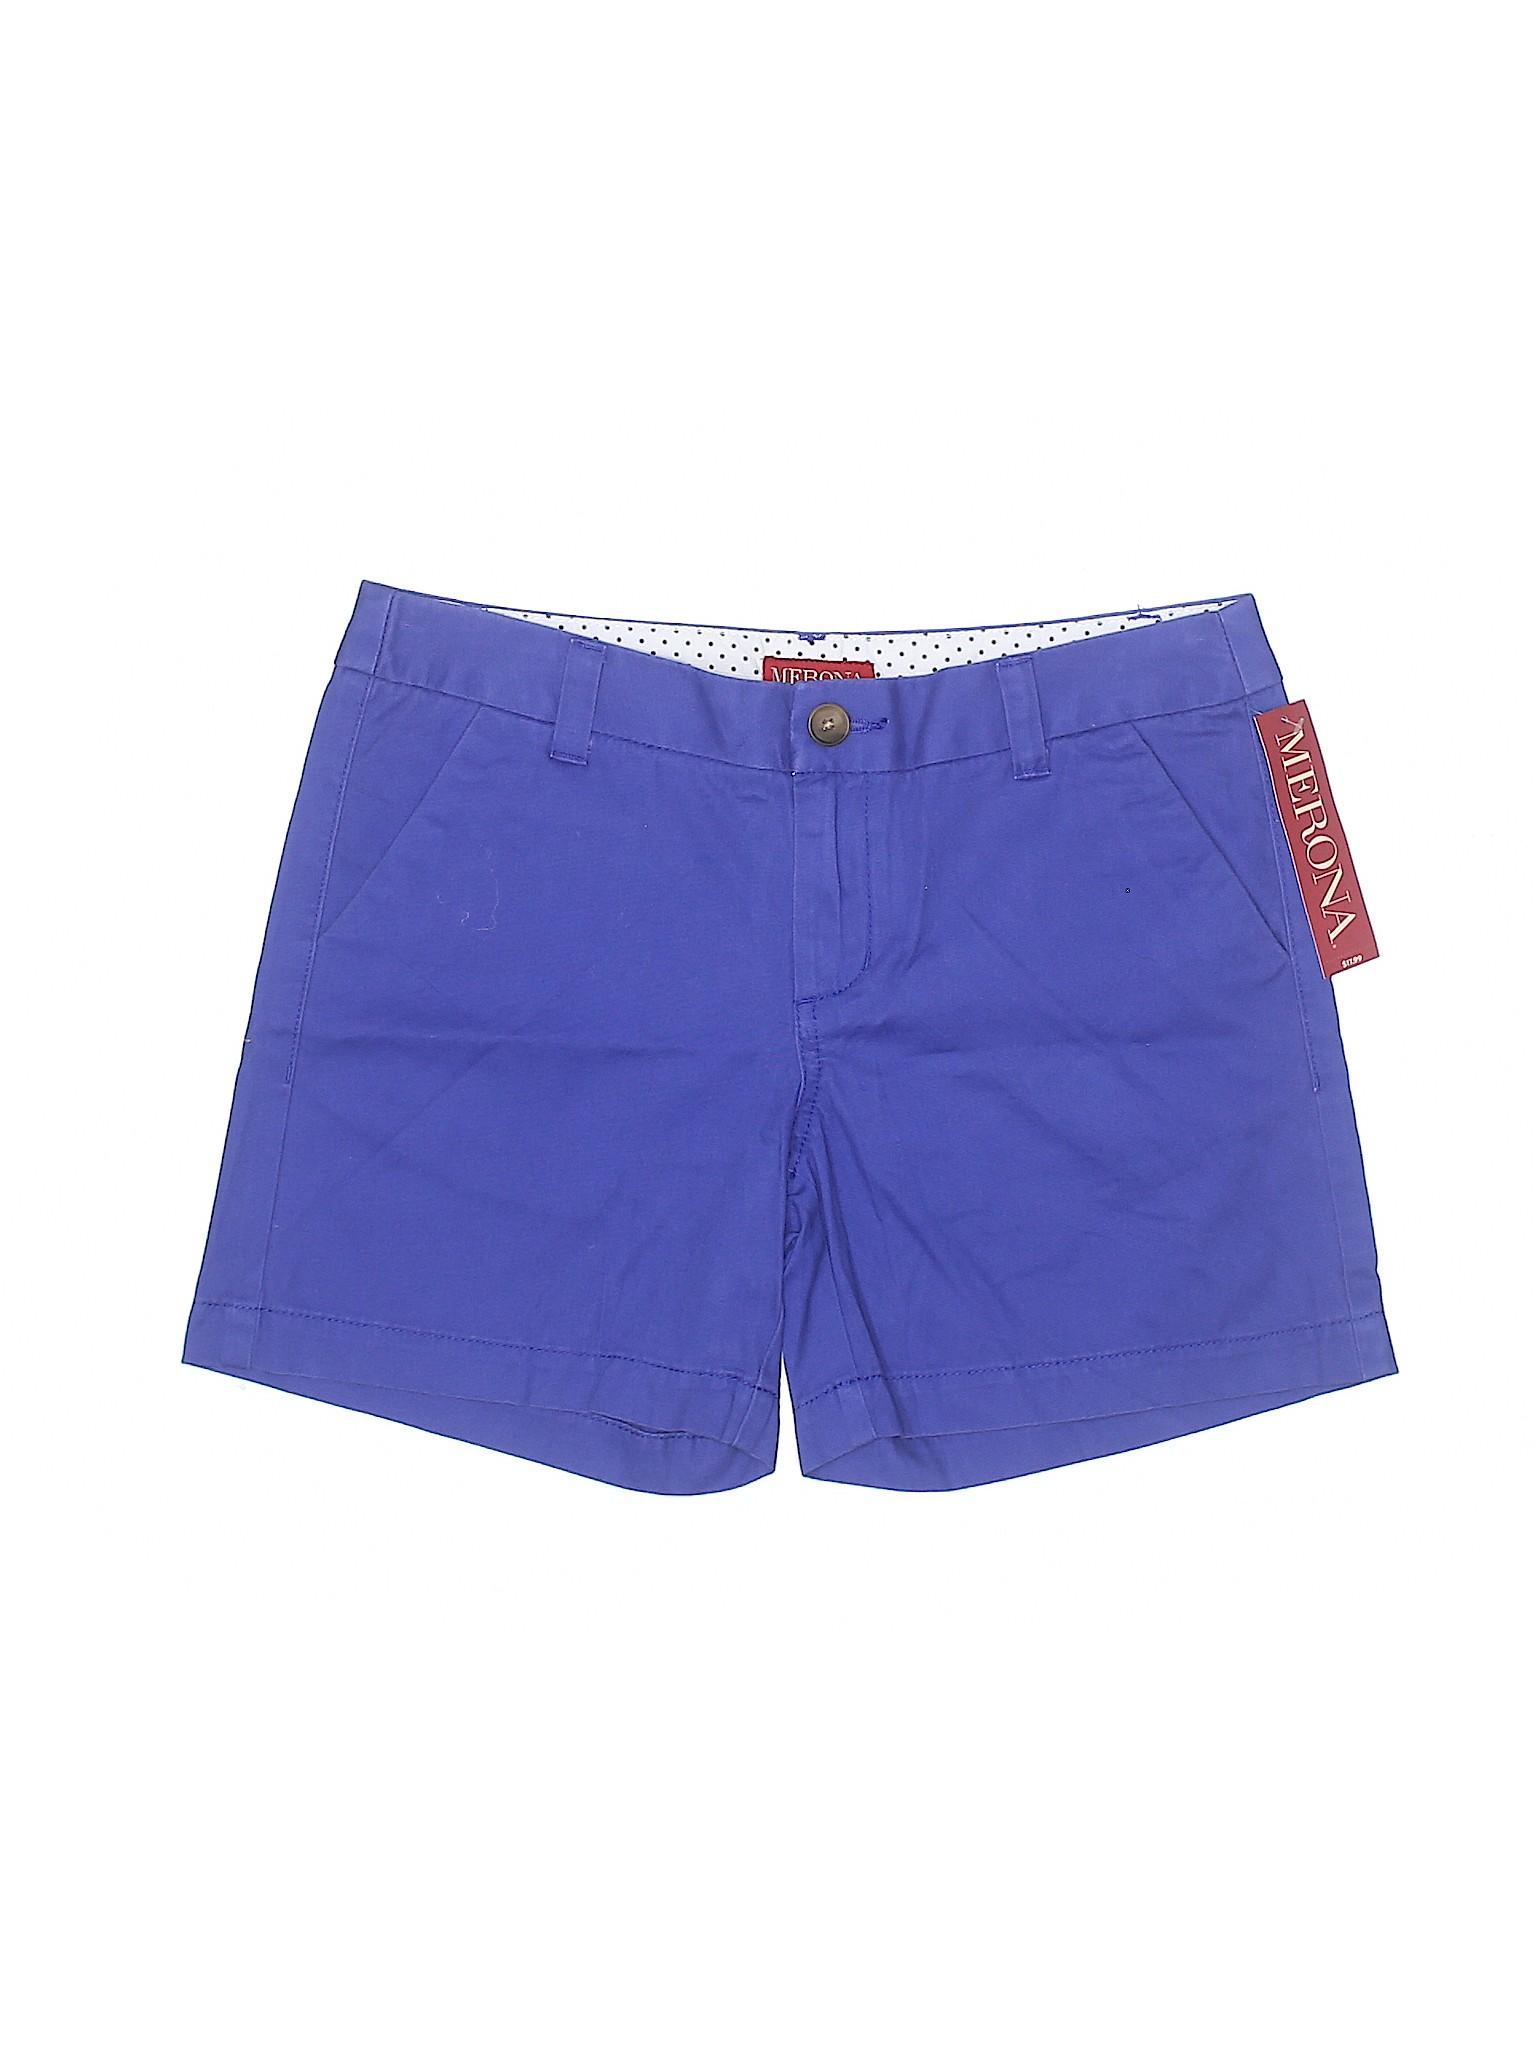 Shorts Boutique Boutique Khaki Merona Merona PnO0nwq81